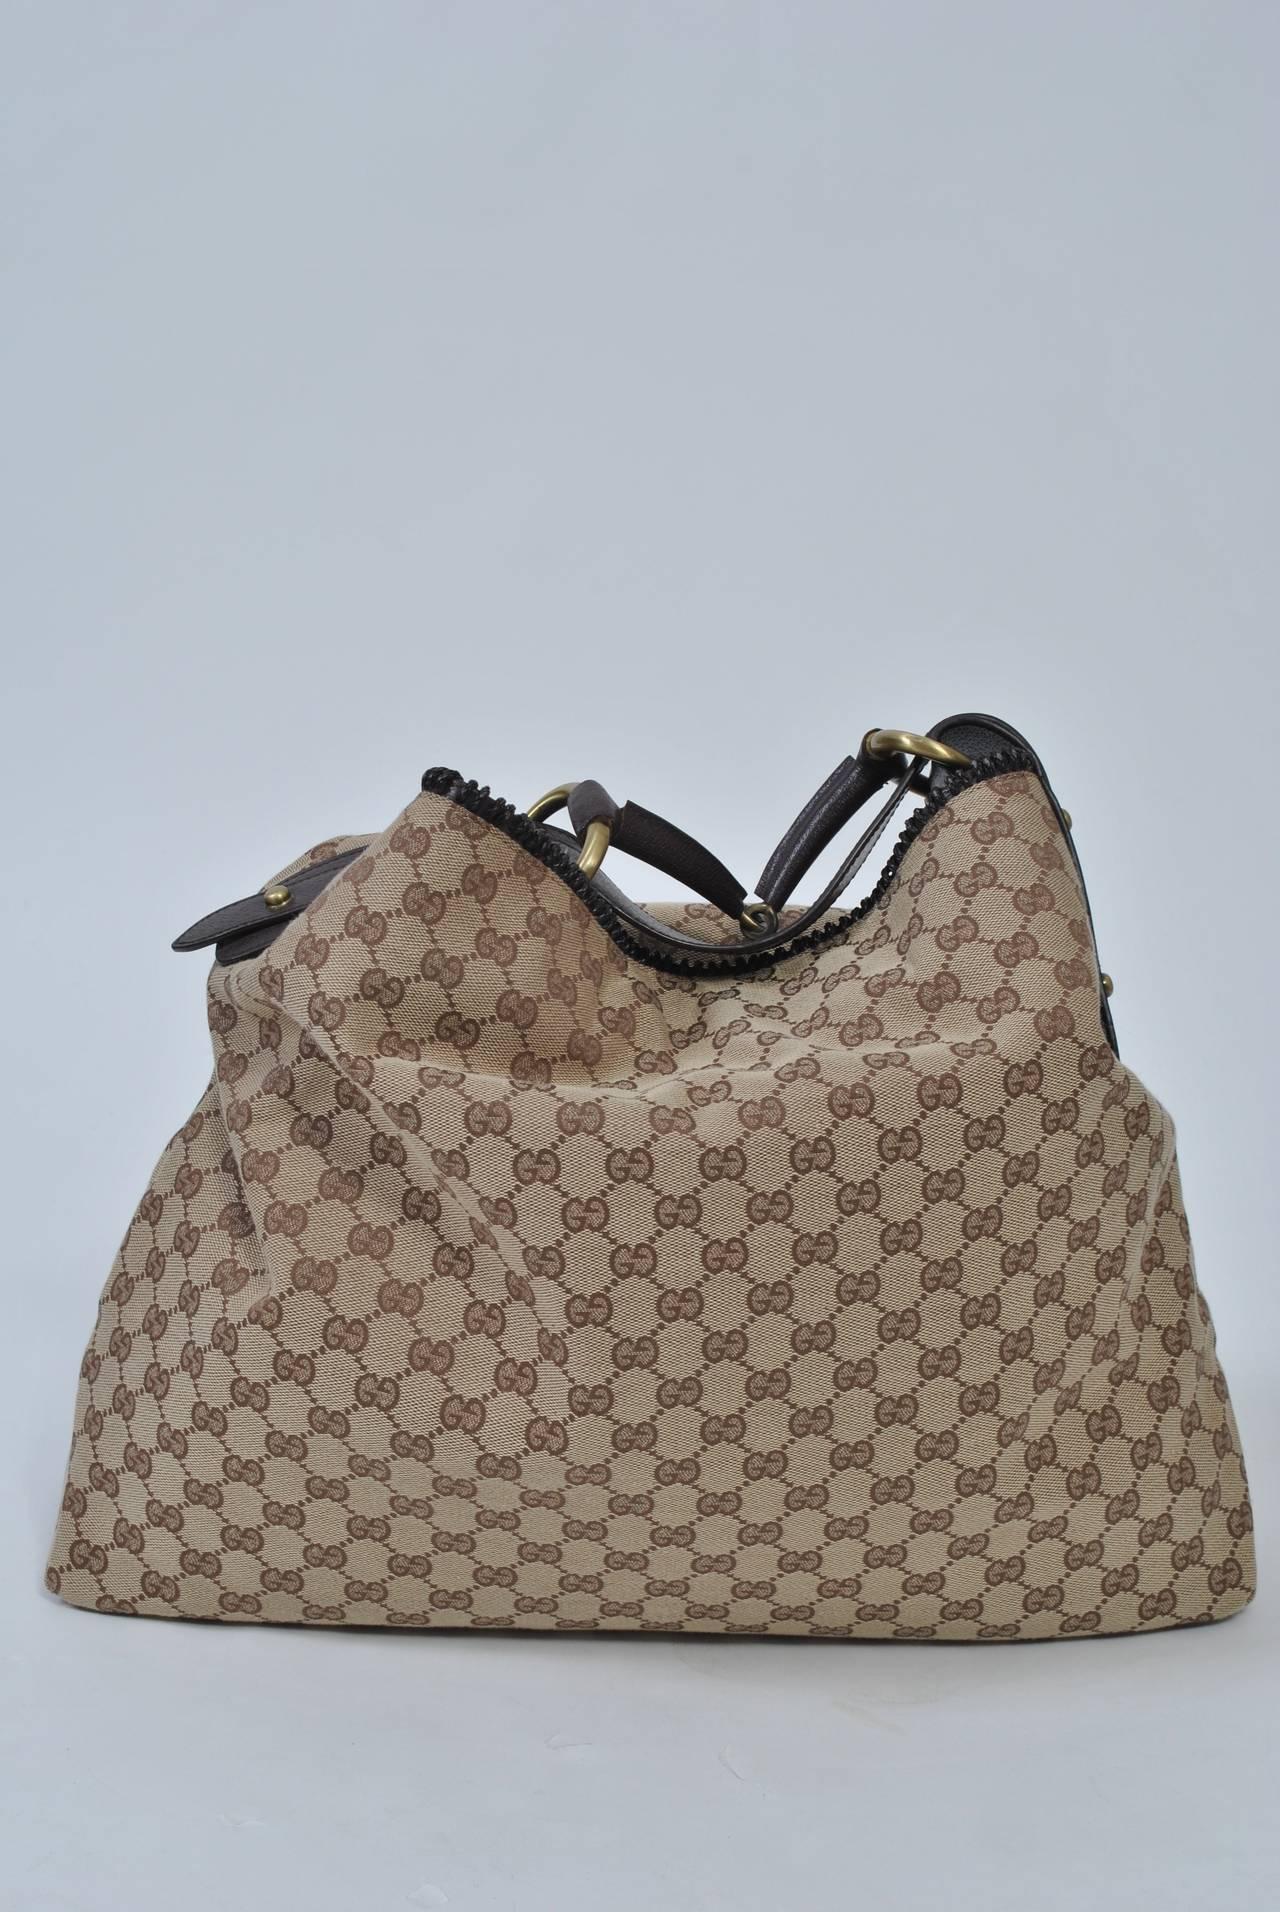 ff00aafd07b2 Gucci Xl Horsebit Hobo Handbag - Handbag Photos Eleventyone.Org